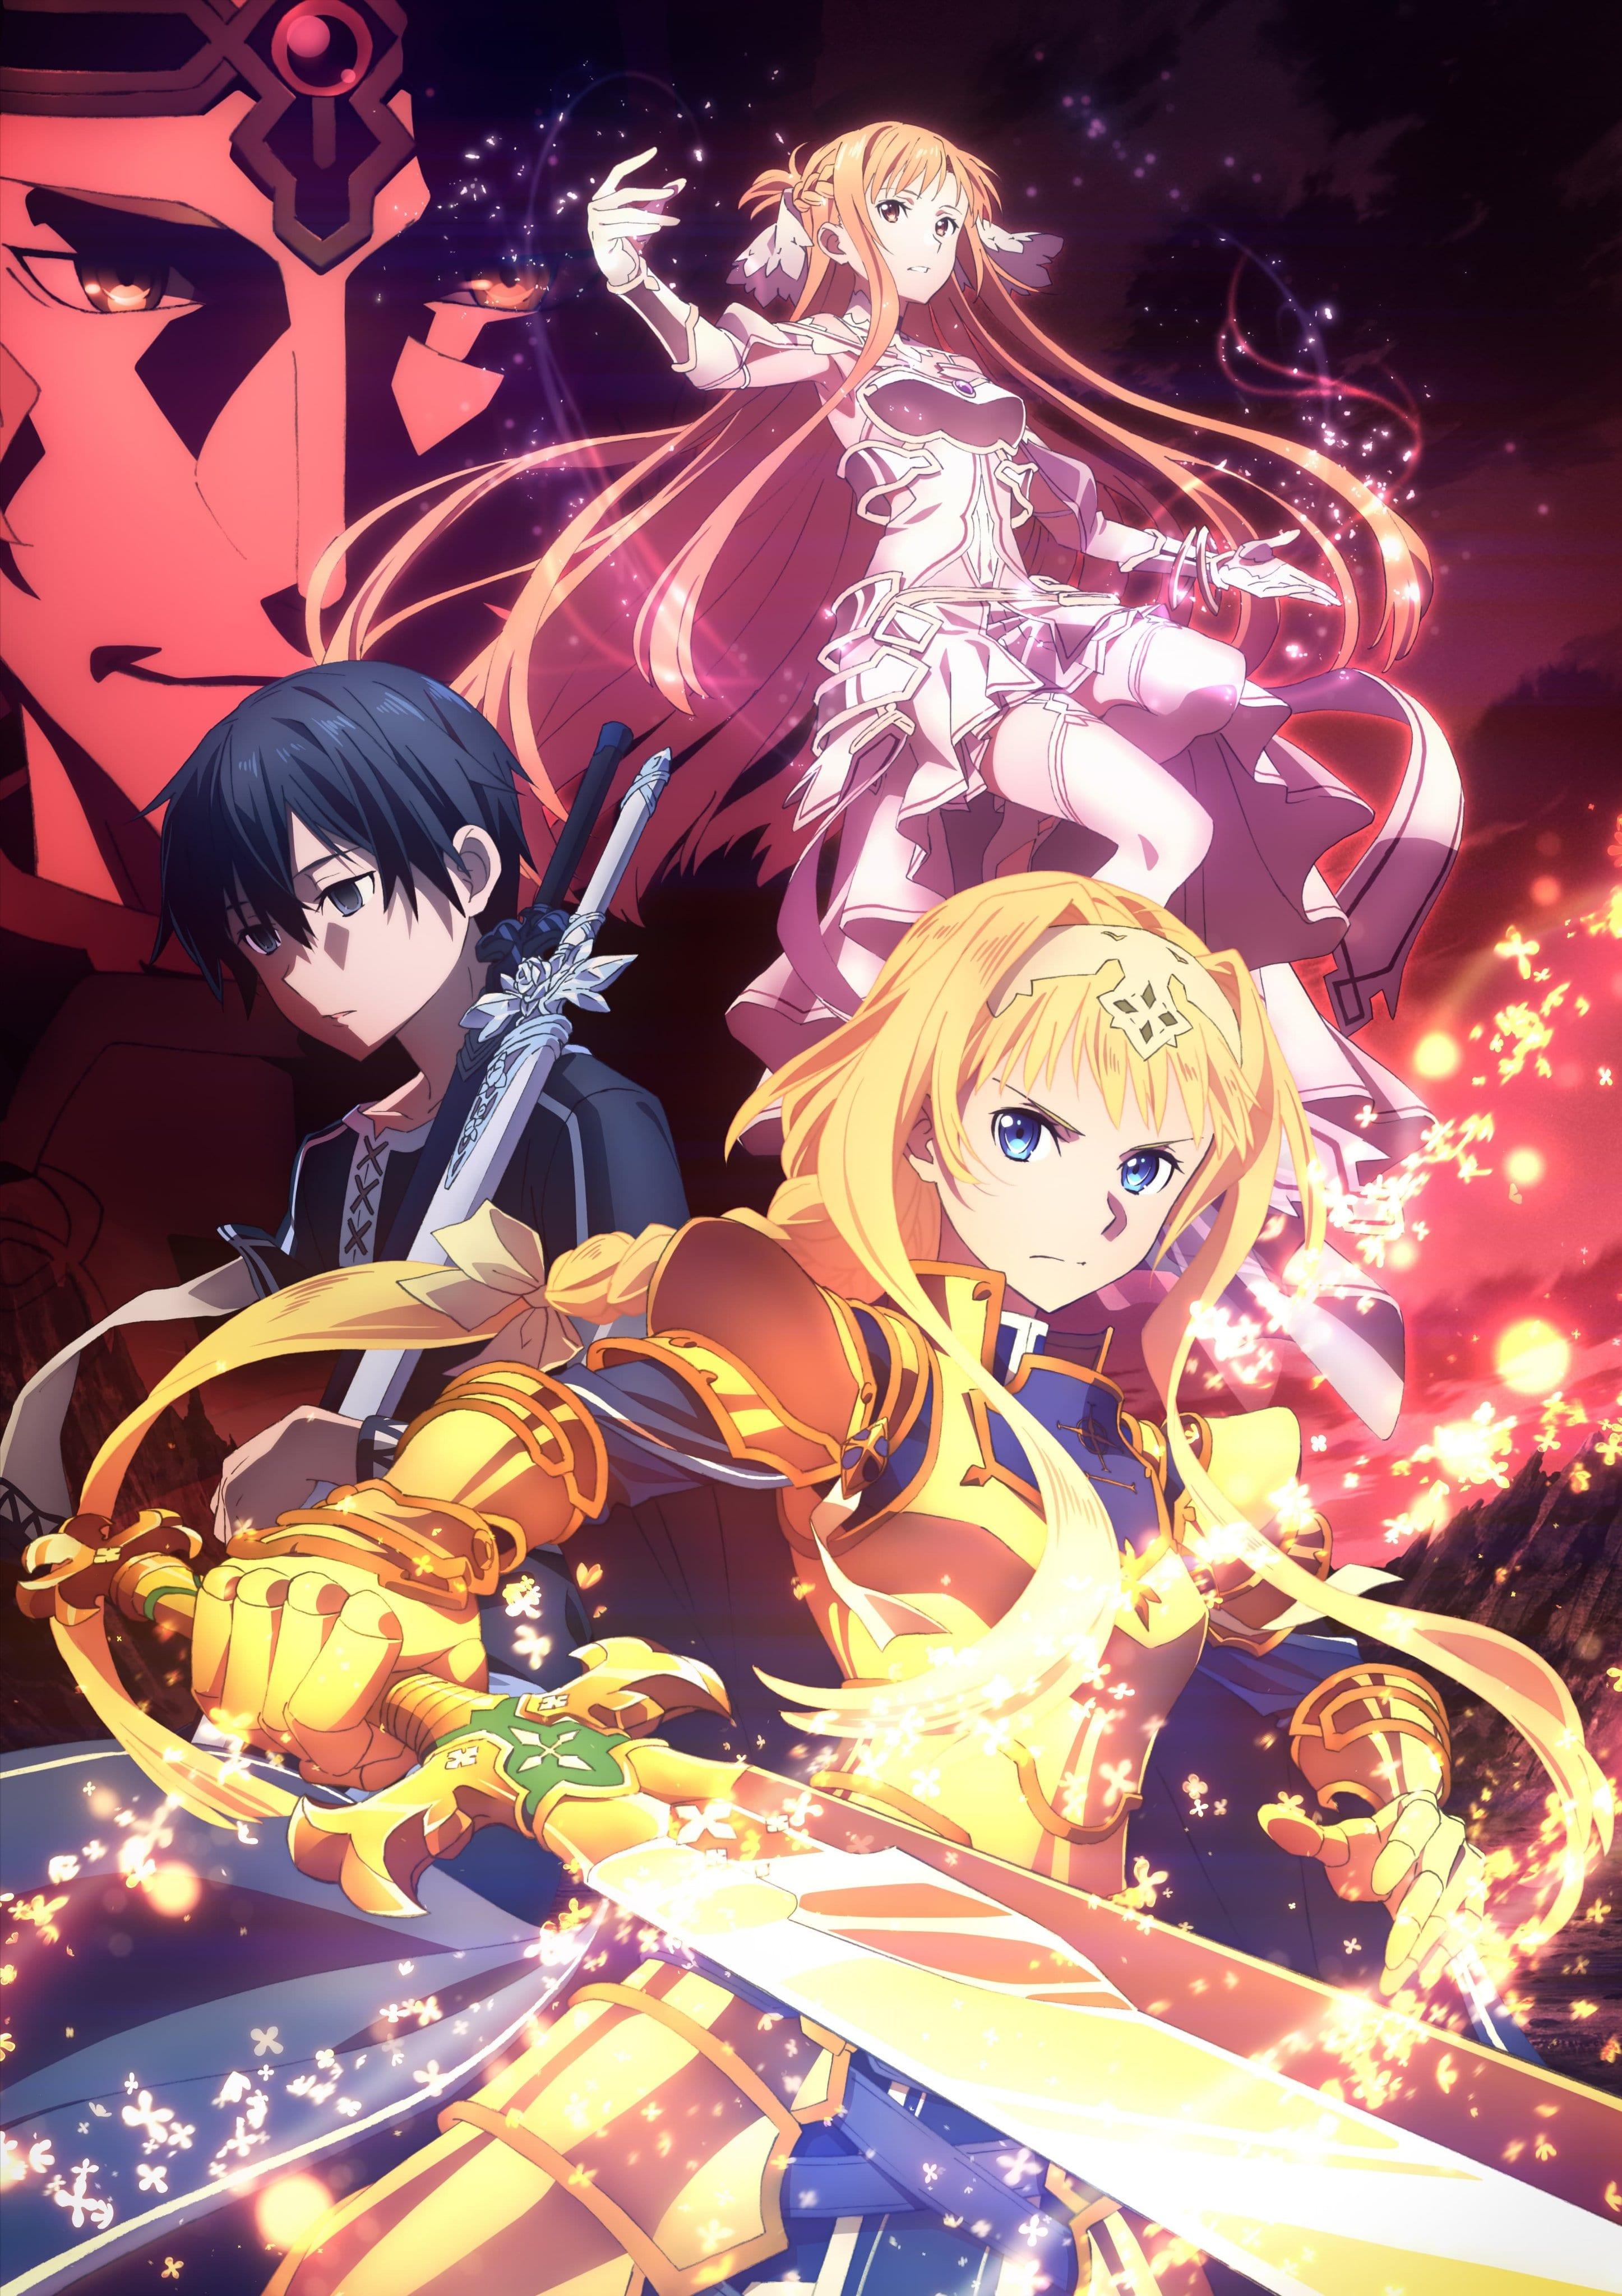 Sword Art Online: Alicization Part 2